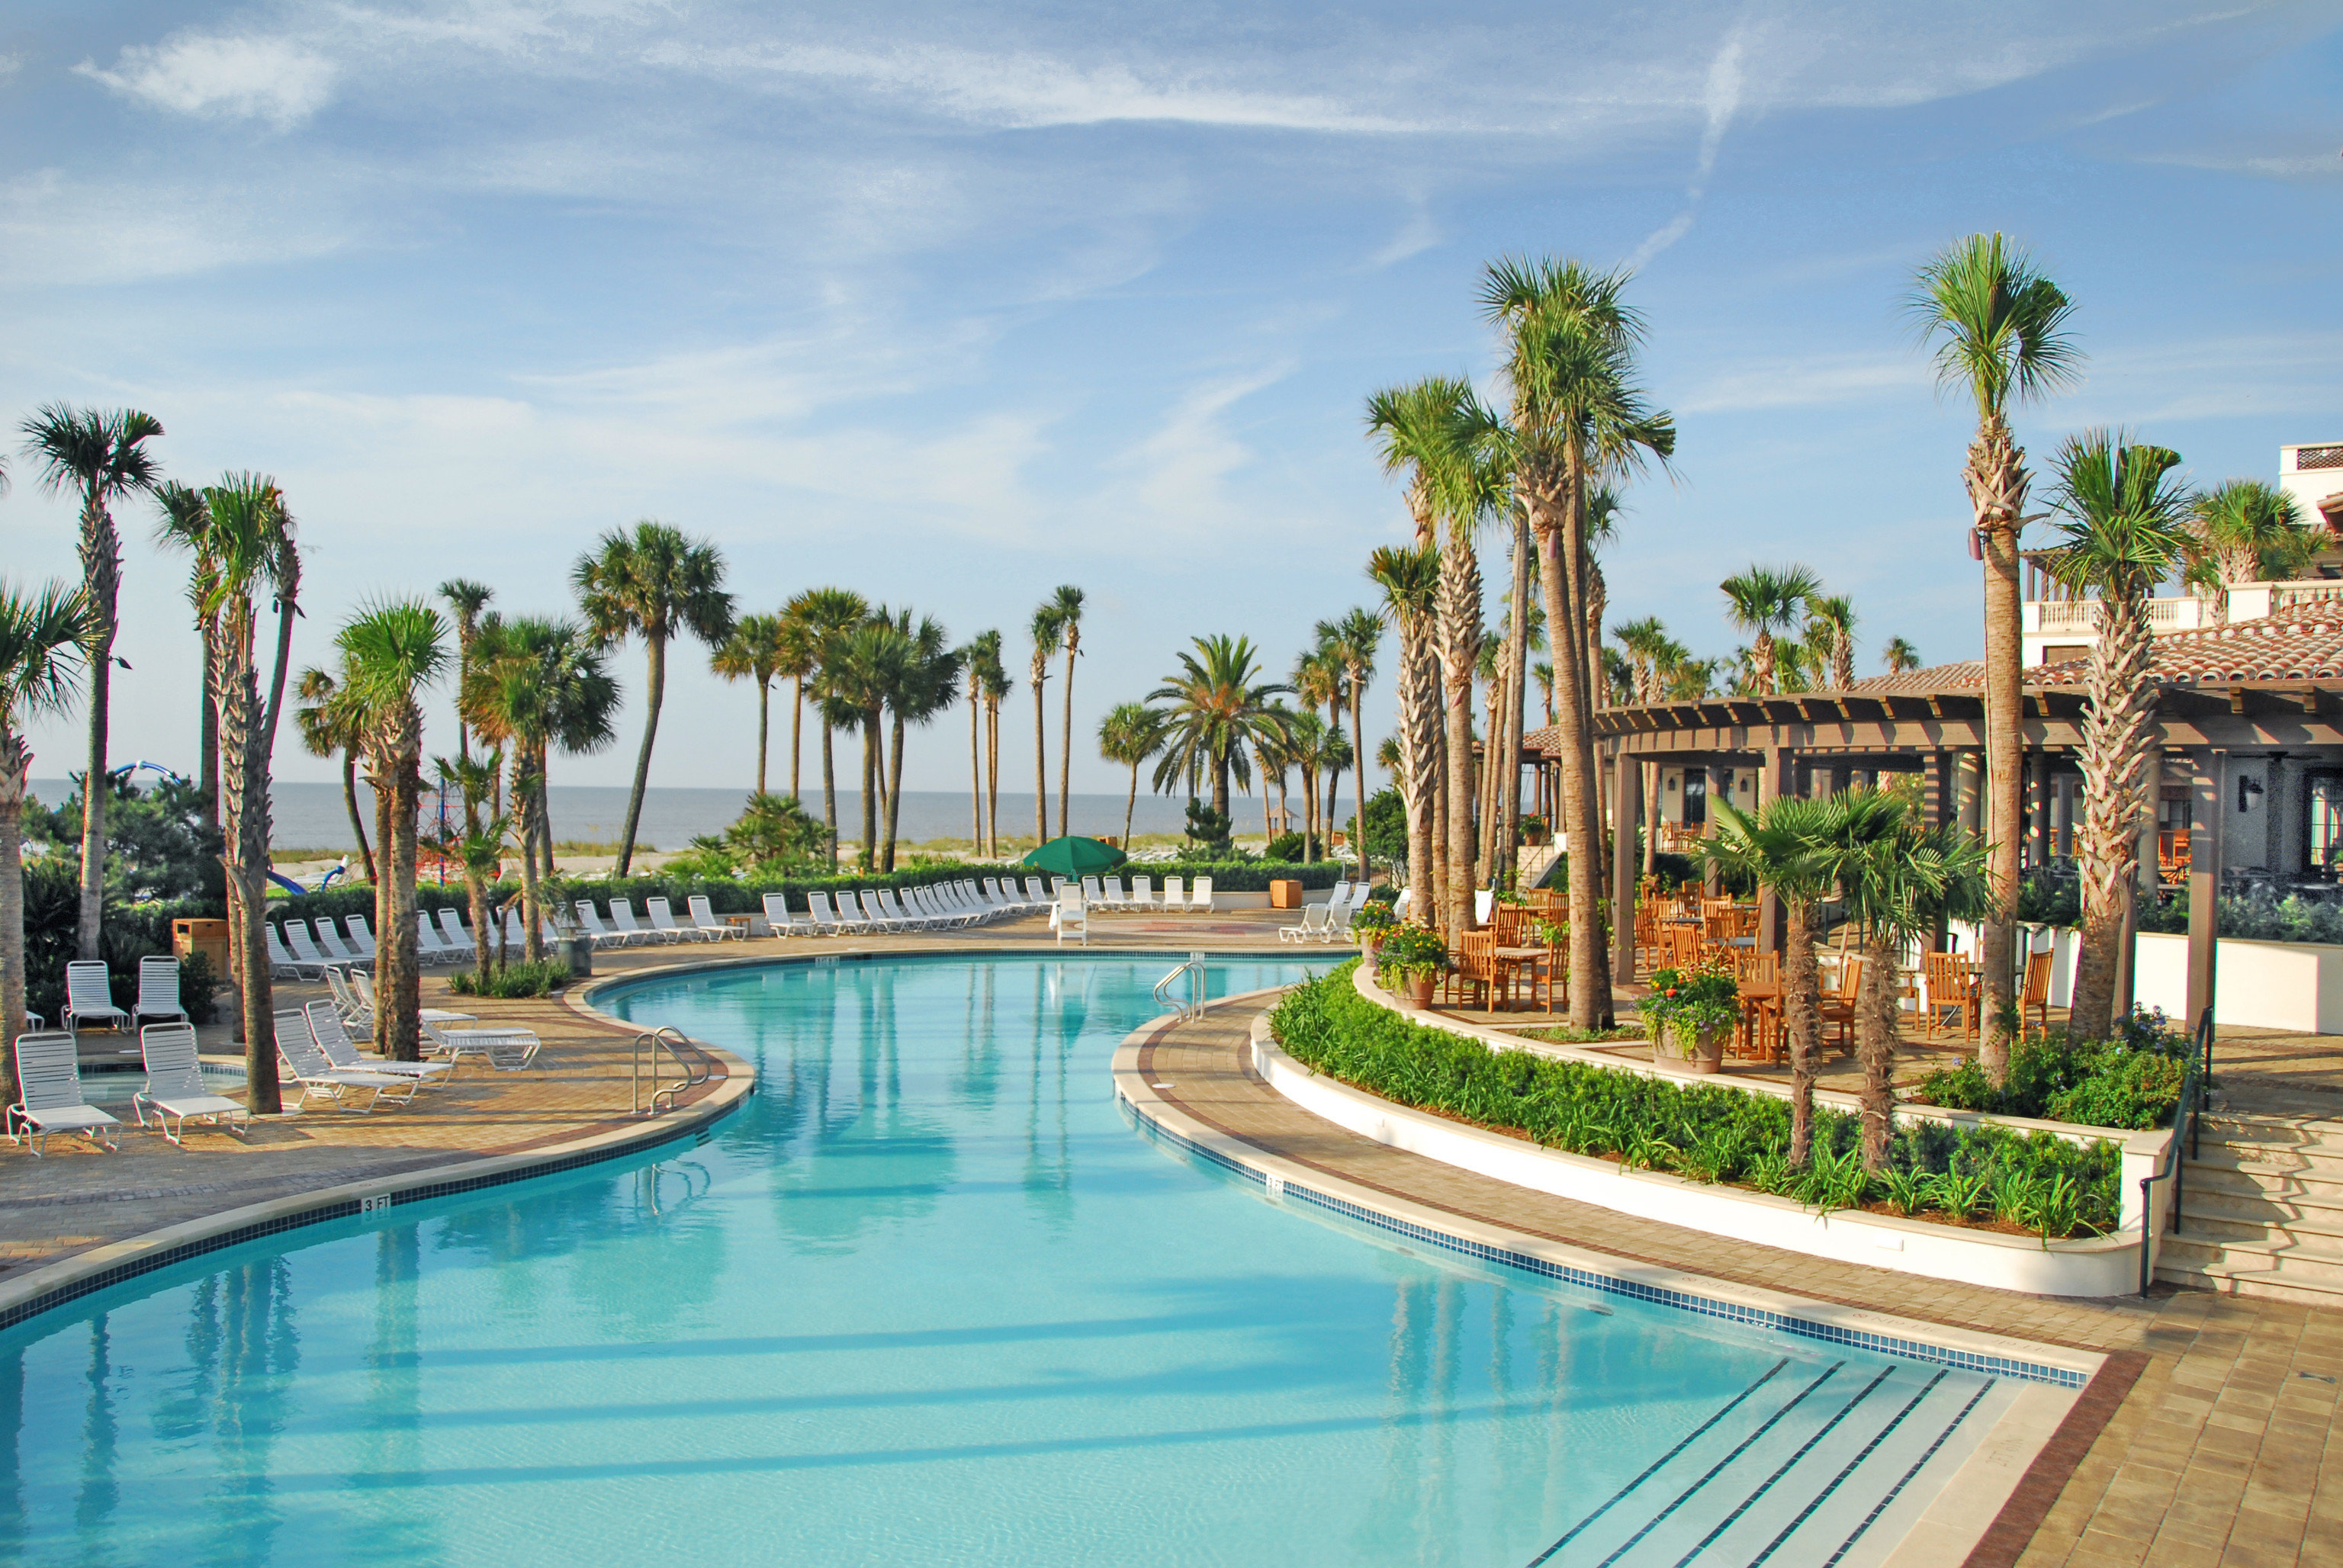 Beach Hotels Islands Luxury Travel Romance Trip Ideas sky tree outdoor swimming pool leisure Resort property amusement park condominium estate vacation Water park resort town park palace colonnade